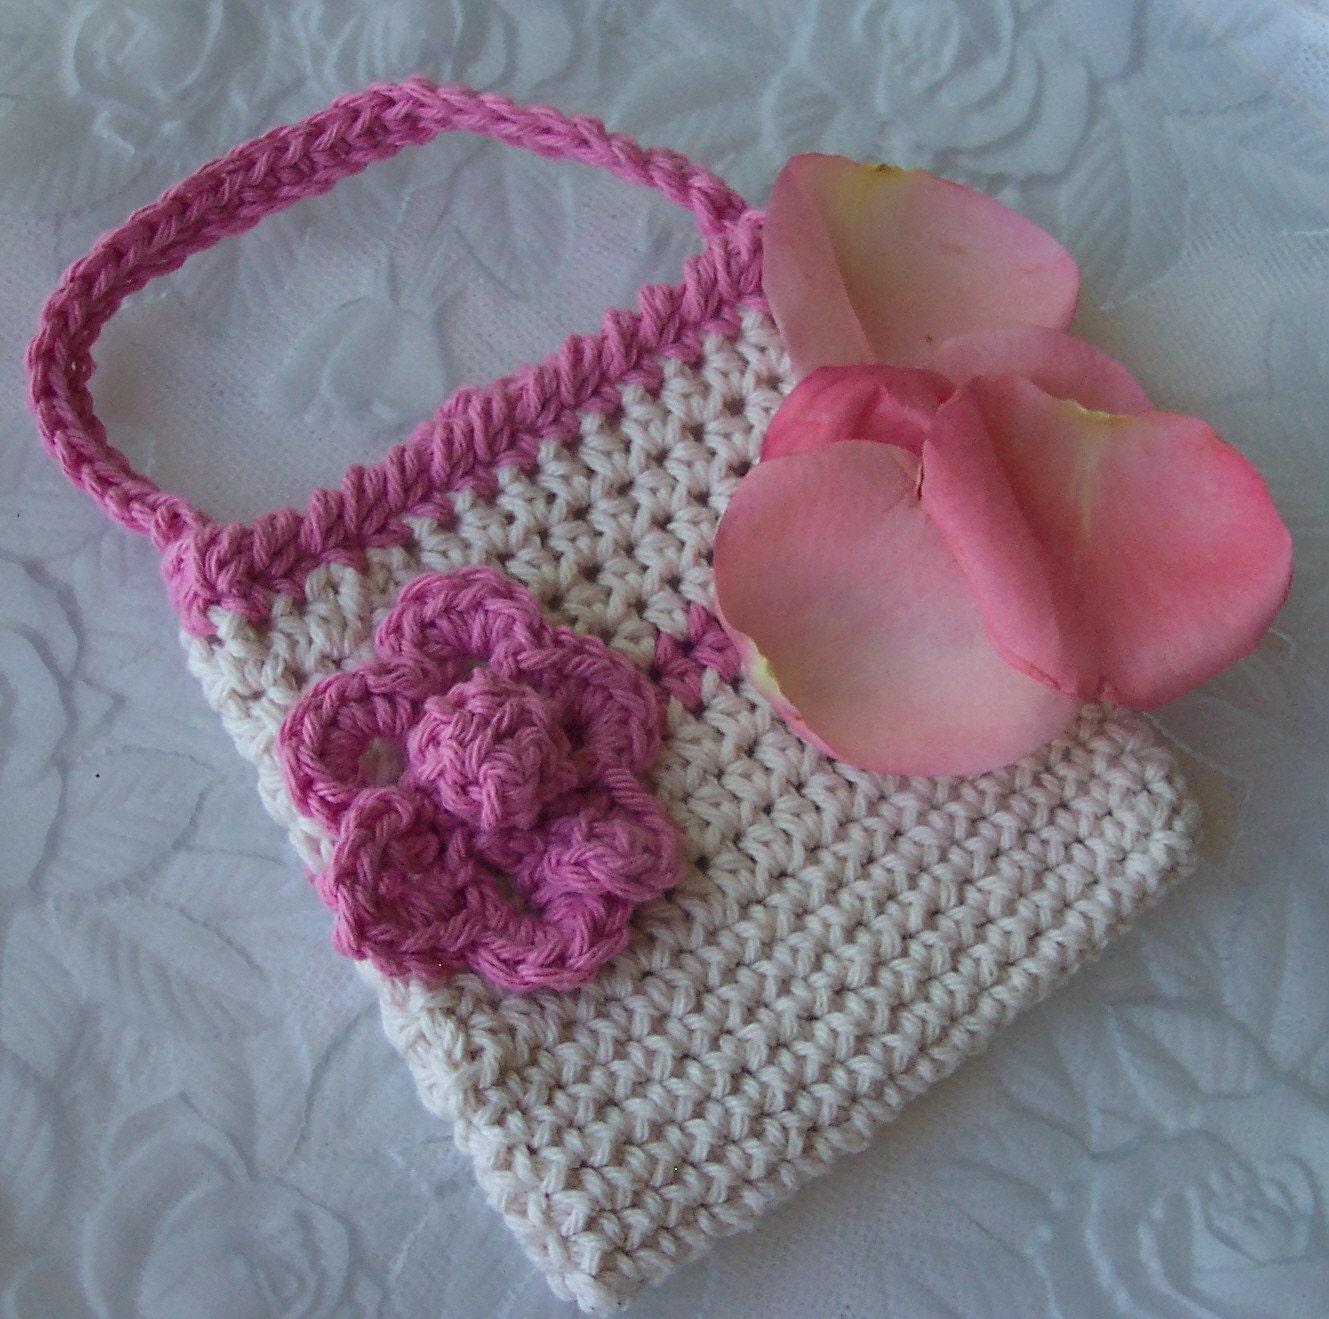 Crochet Little Purse : similar to Little Girls Purse with Flower. Crochet Purse, Cotton Purse ...